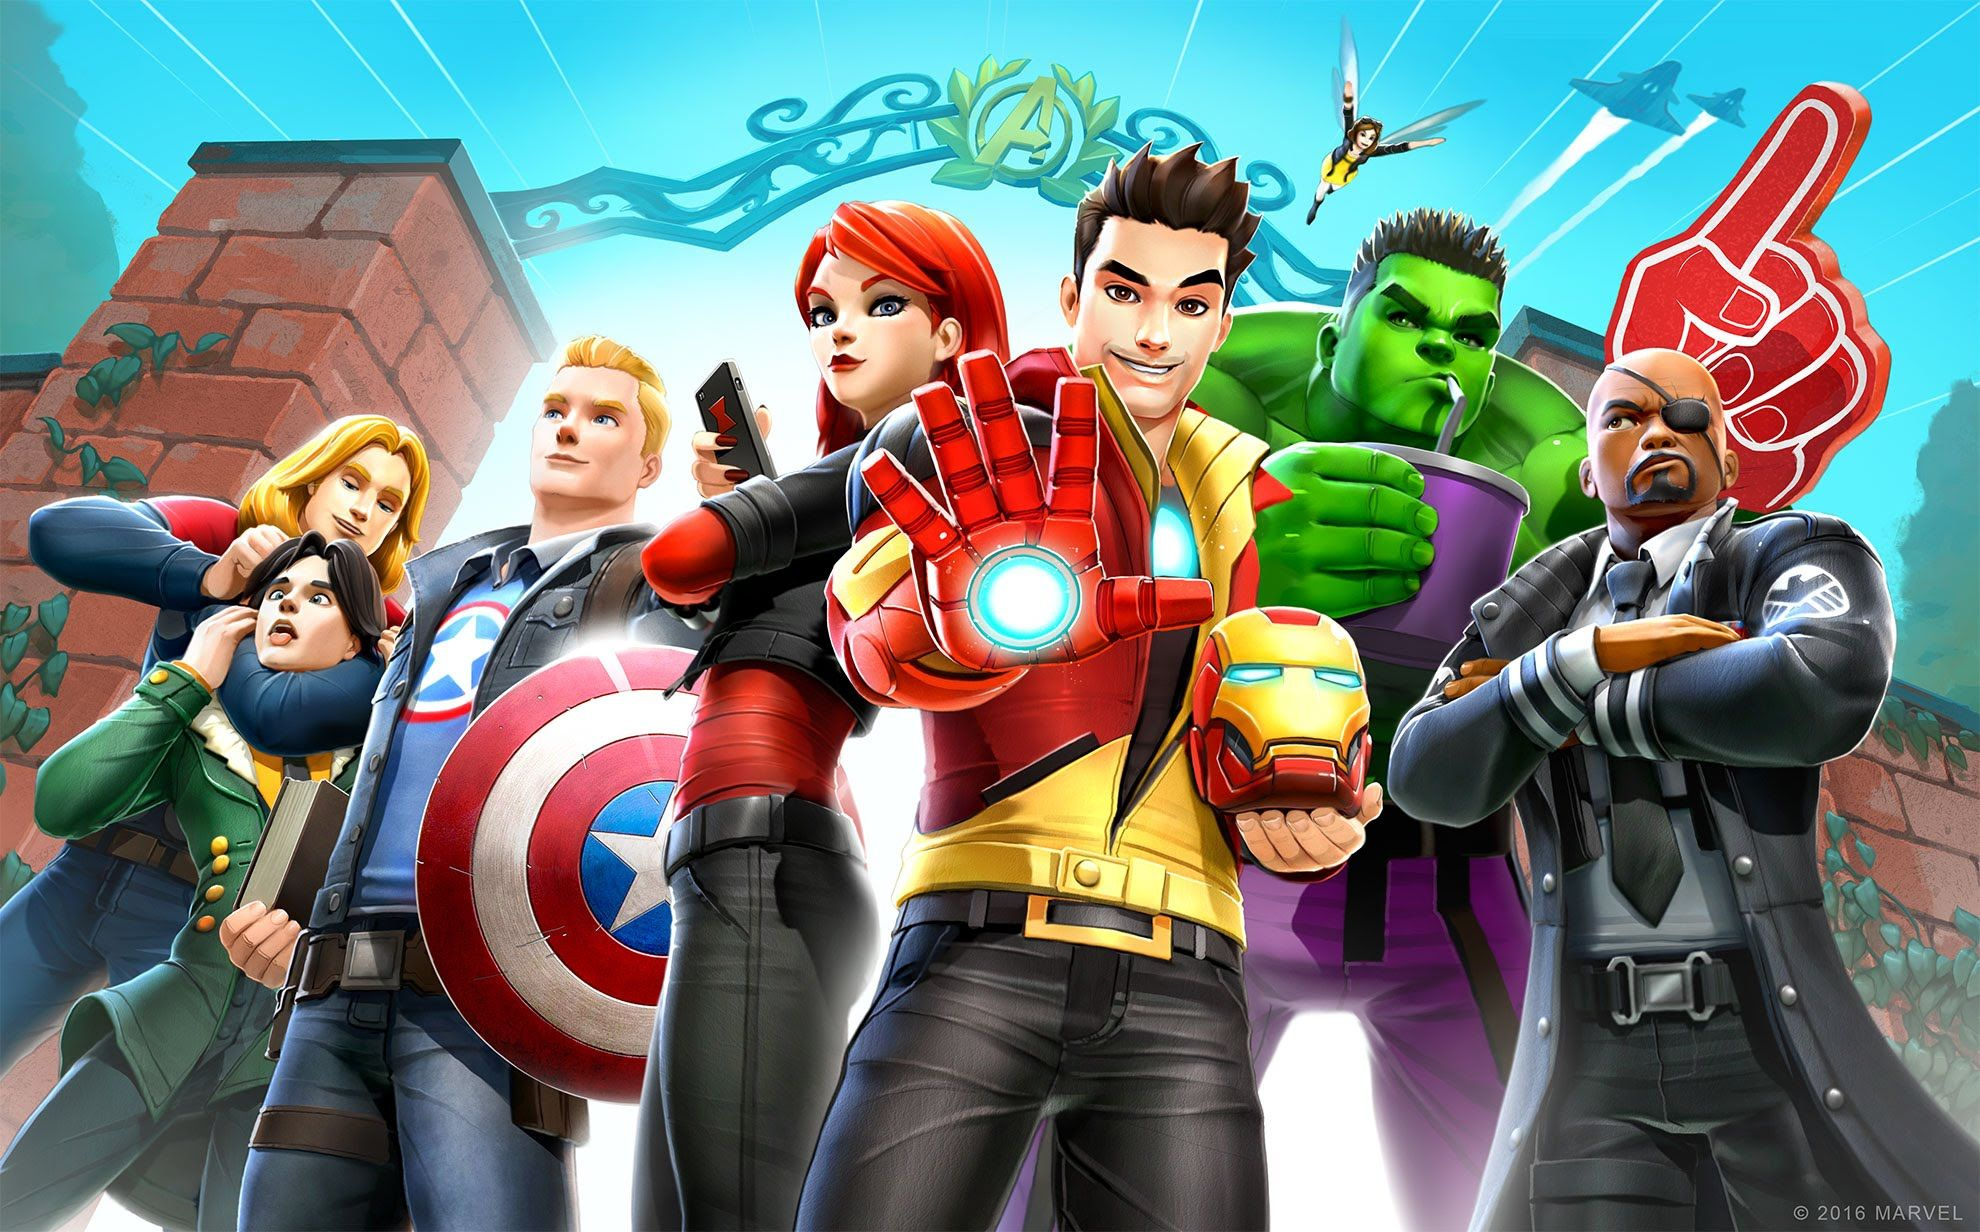 Avengers Cartoon Wallpapers - Top Free Avengers Cartoon ...